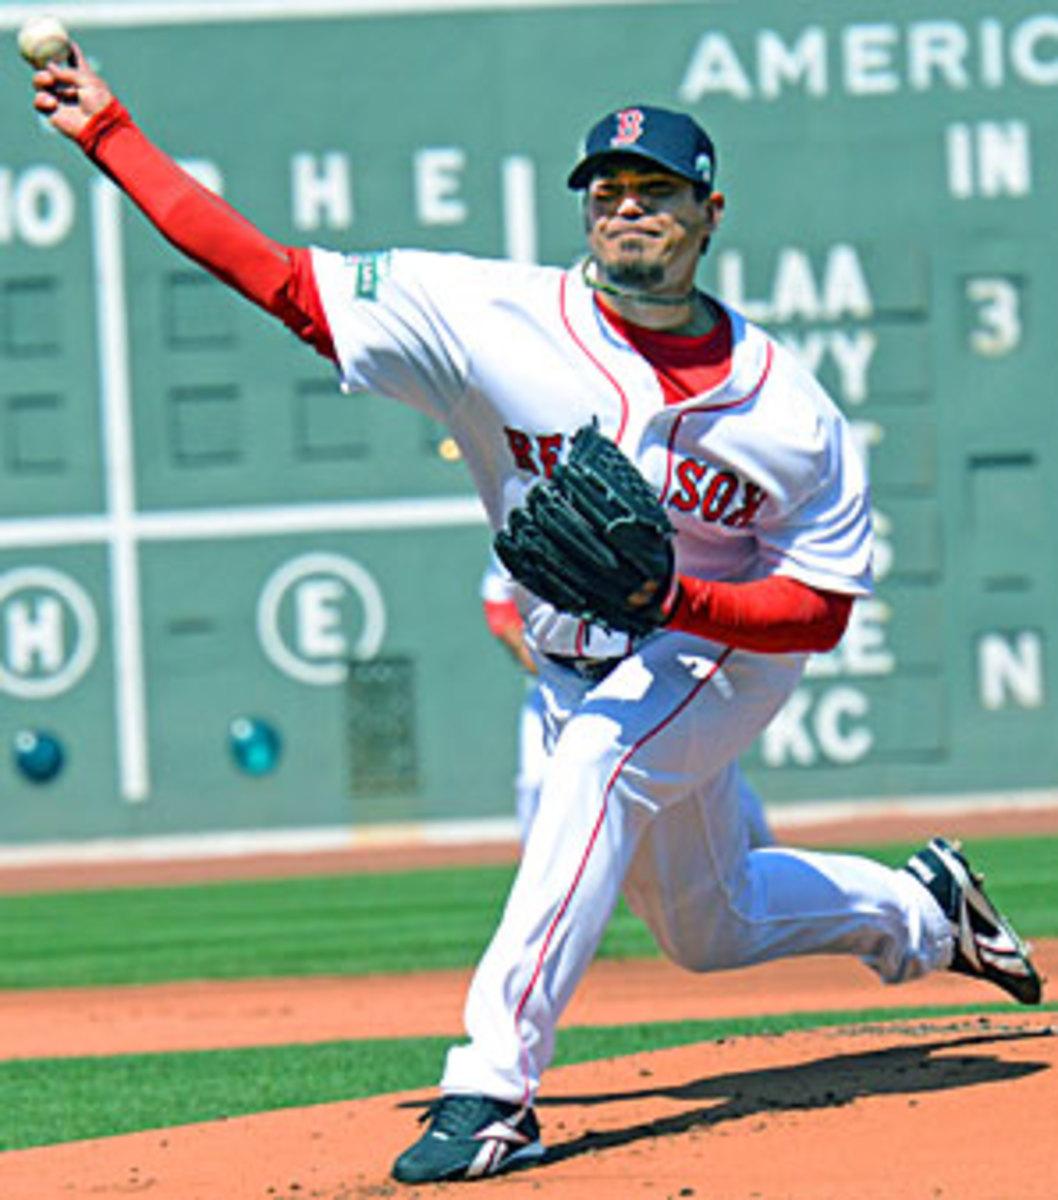 10 Josh Beckett Baseball Card Value Pictures